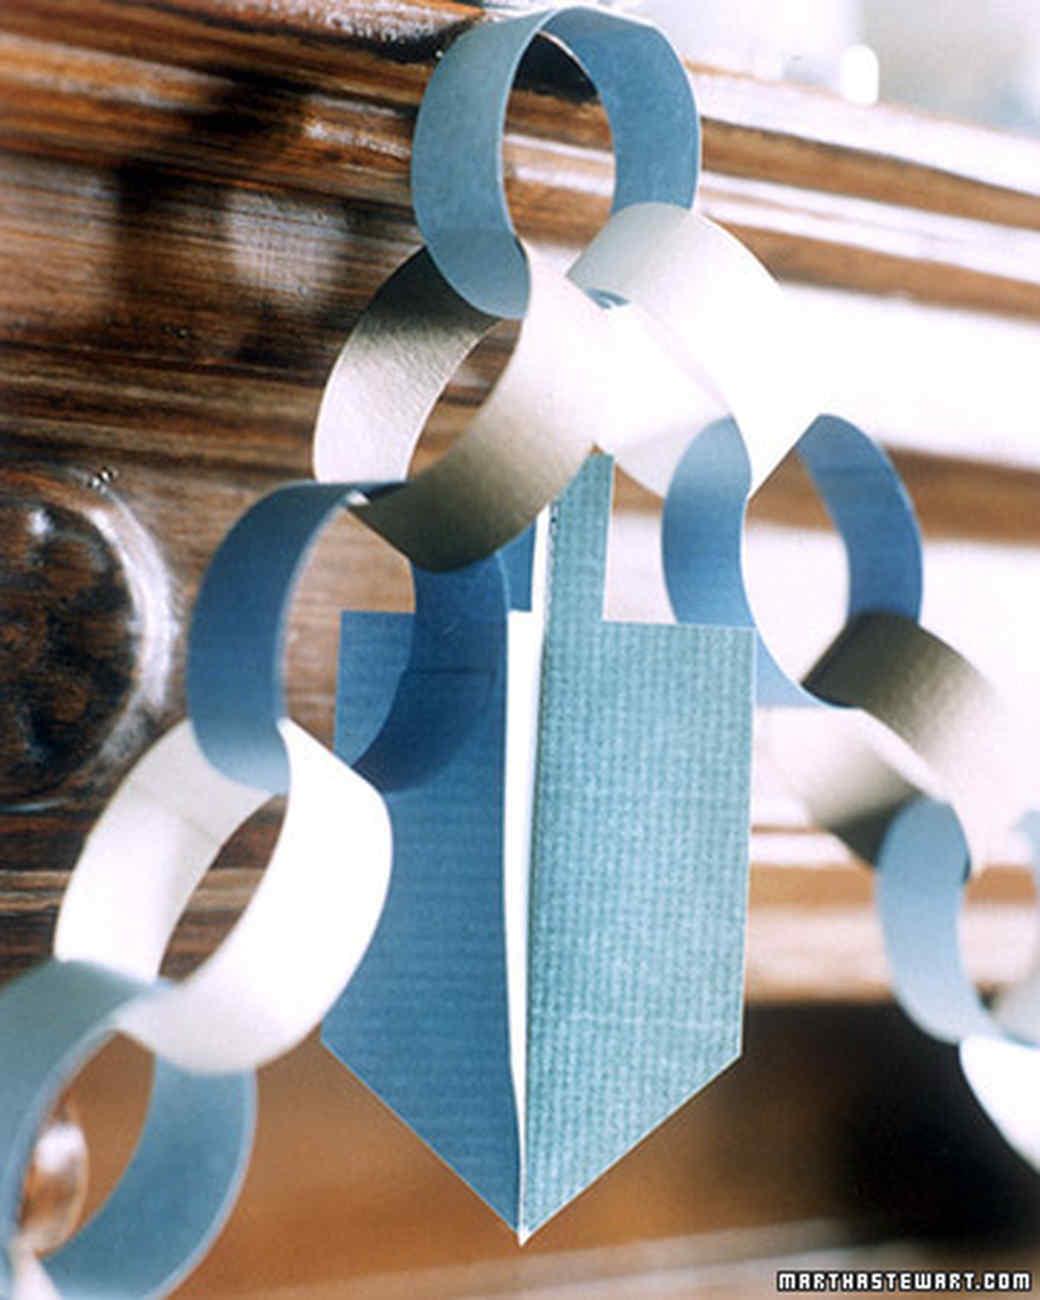 Hanukkah Crafts and Decorations